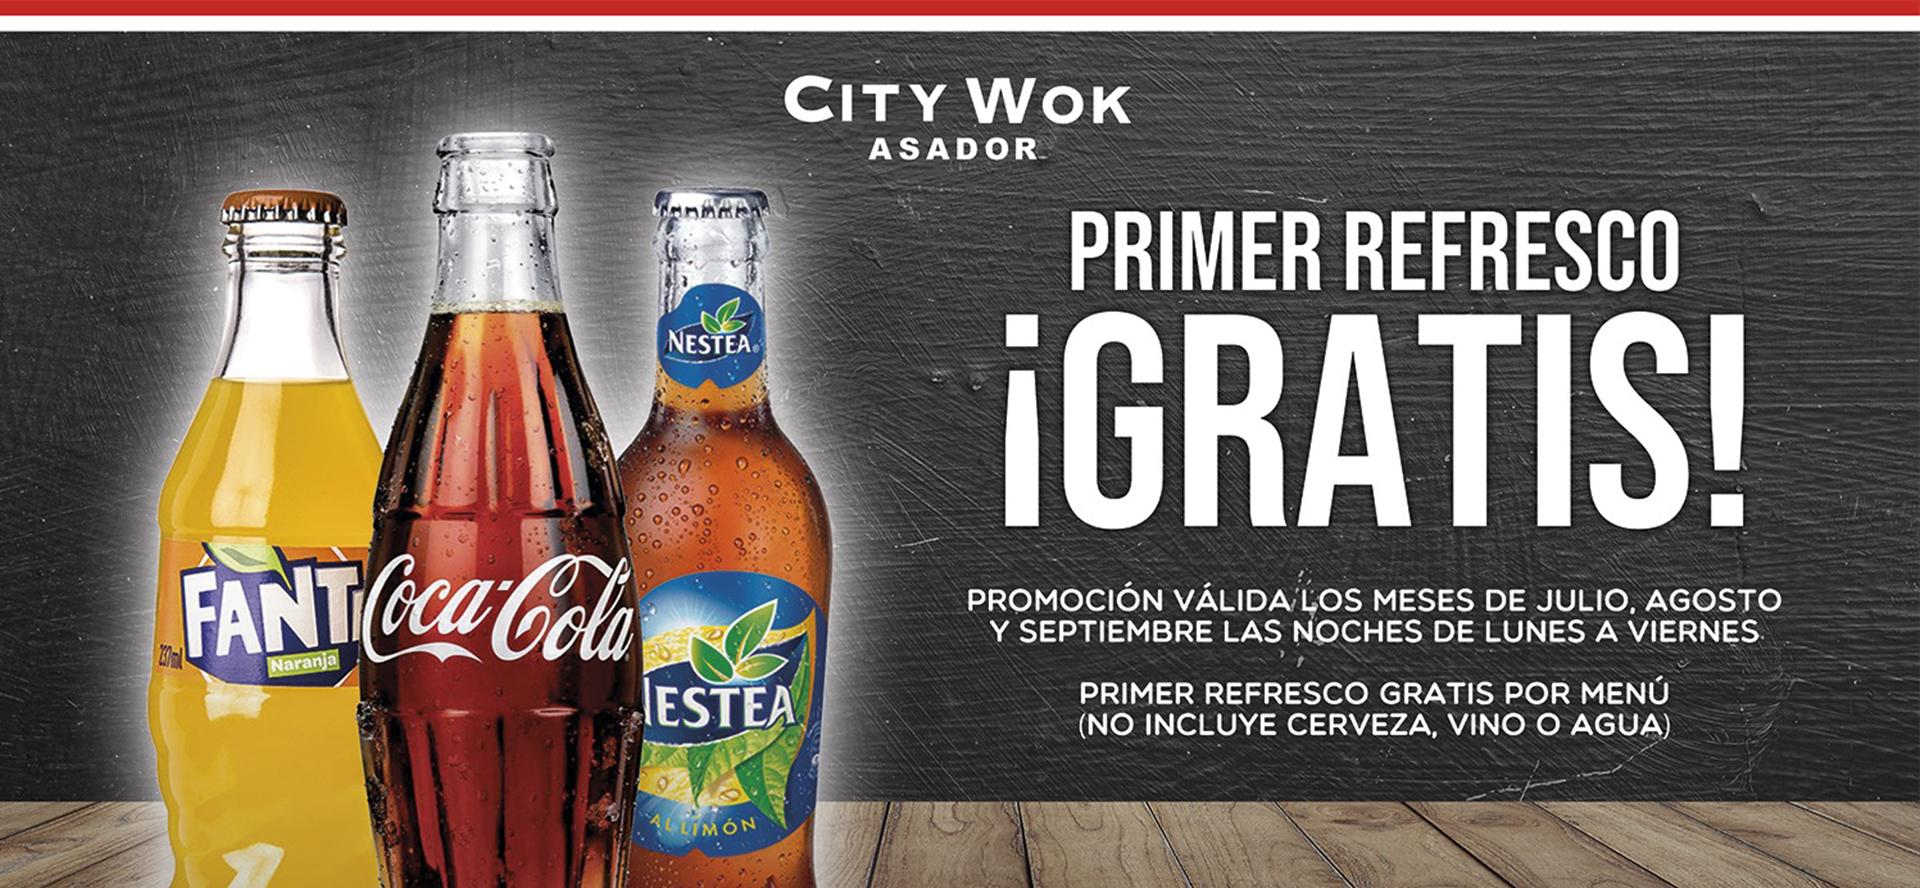 Oferta bebida gratis citywok elche